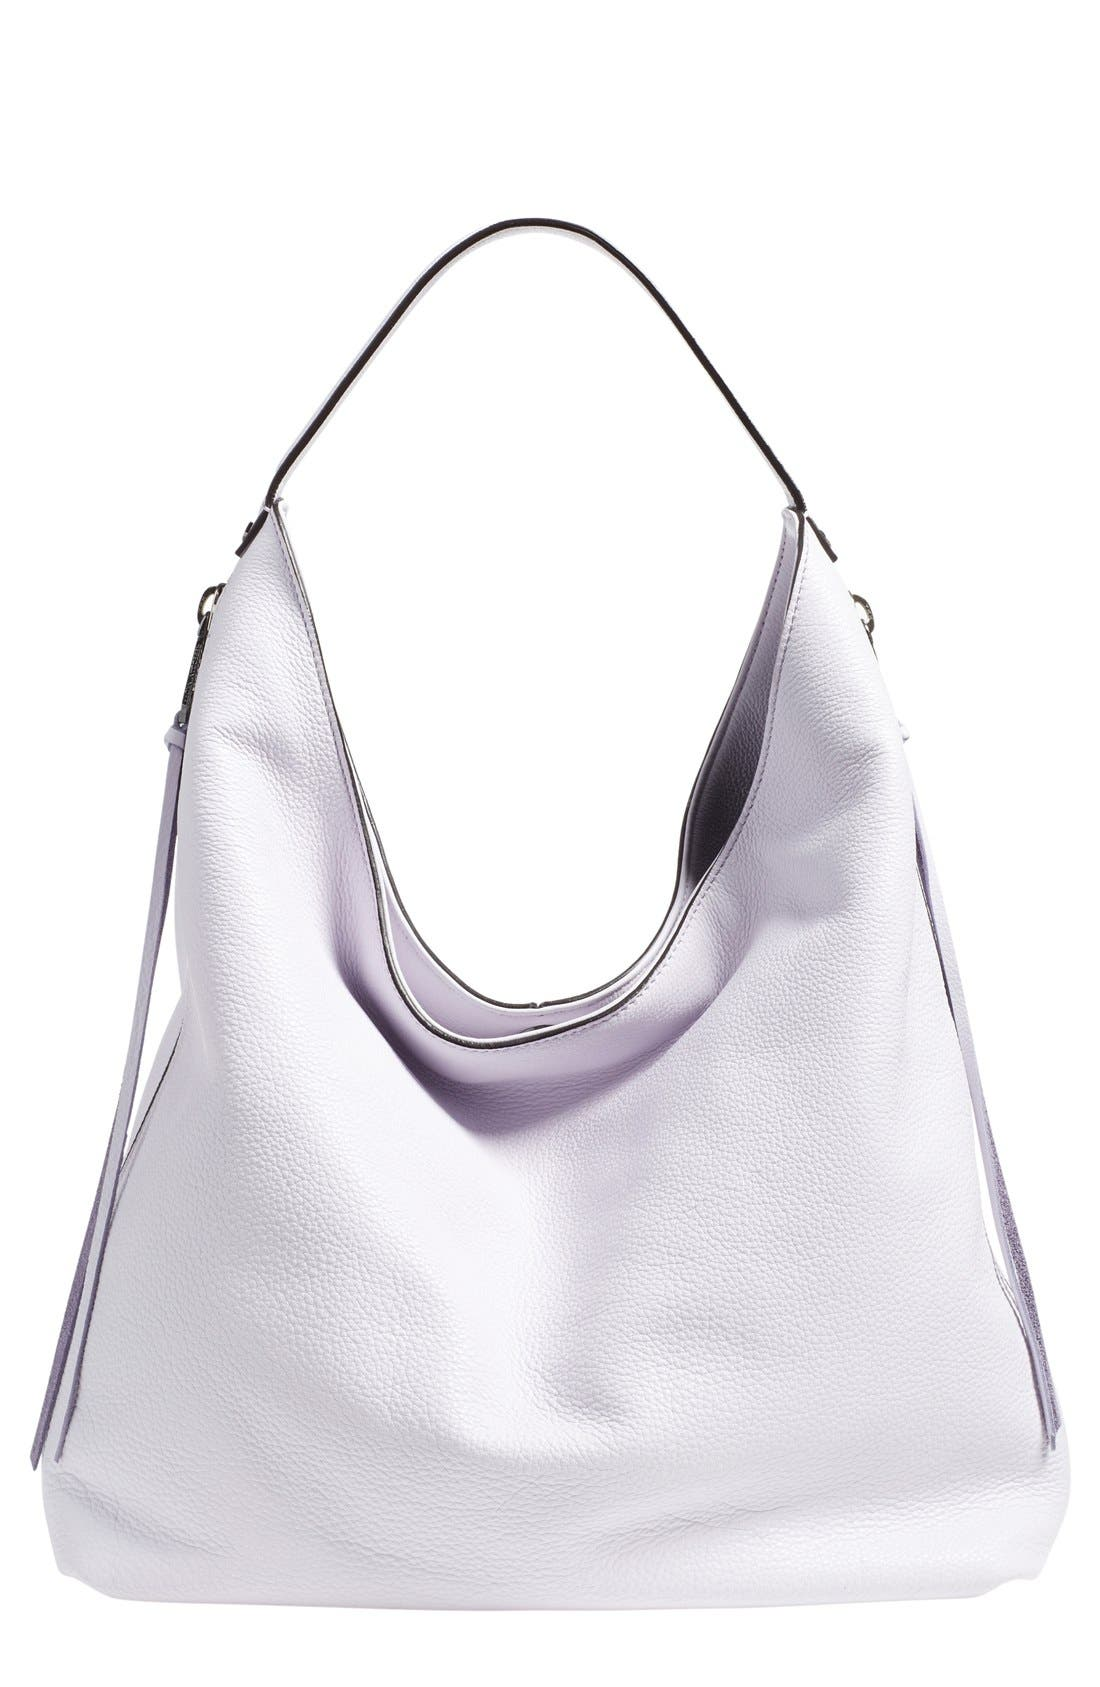 'Bryn' Hobo Bag, Main, color, 506